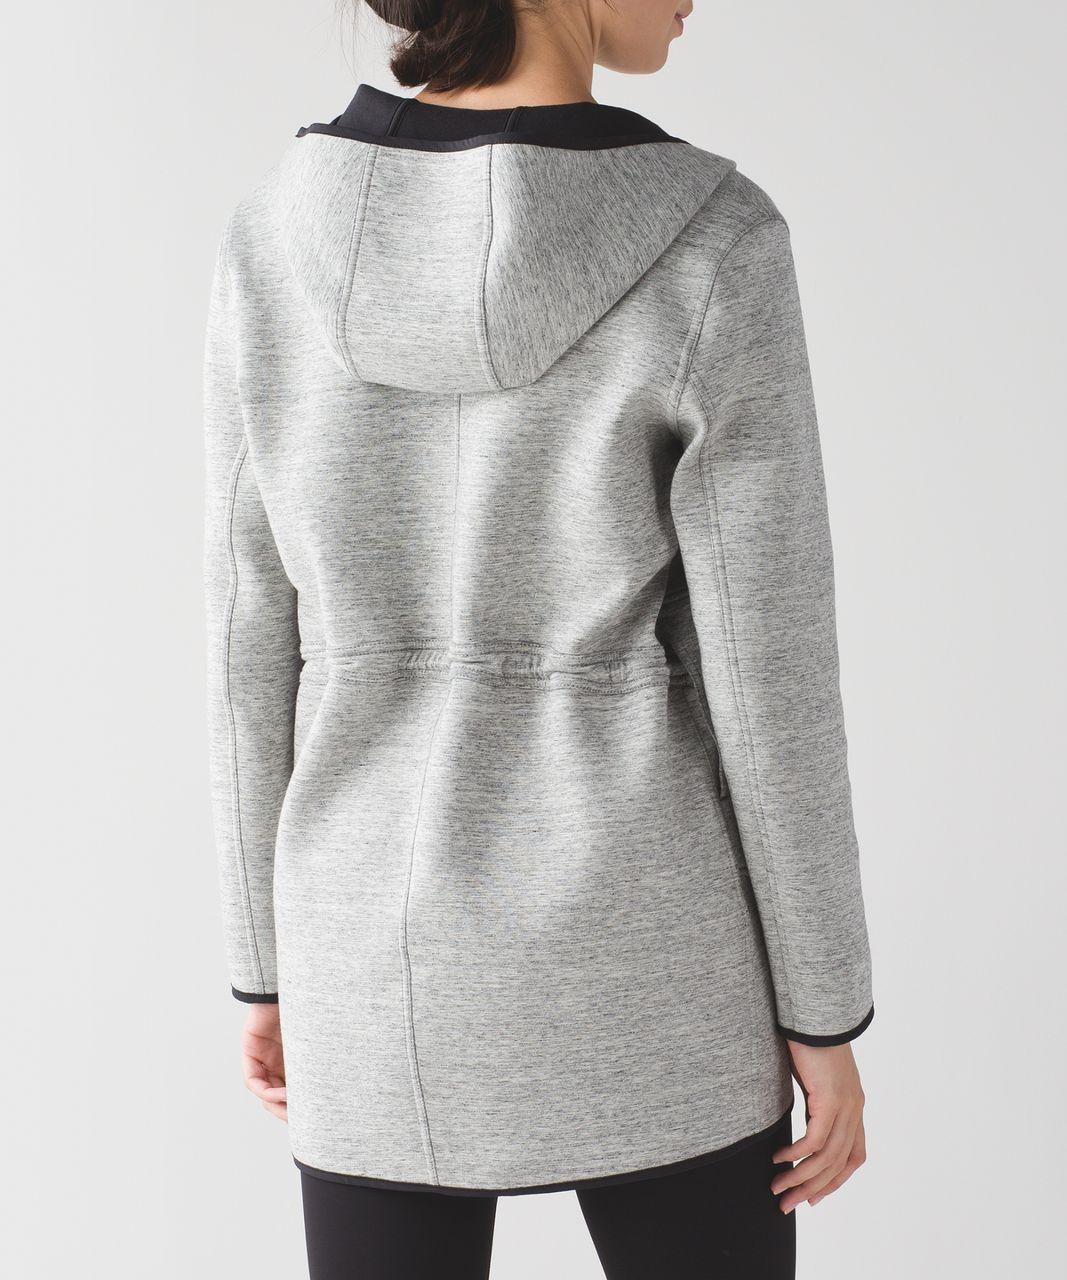 686334680fd71 Lululemon City Bound Wrap - Heathered Space Dyed Medium Grey / Black ...